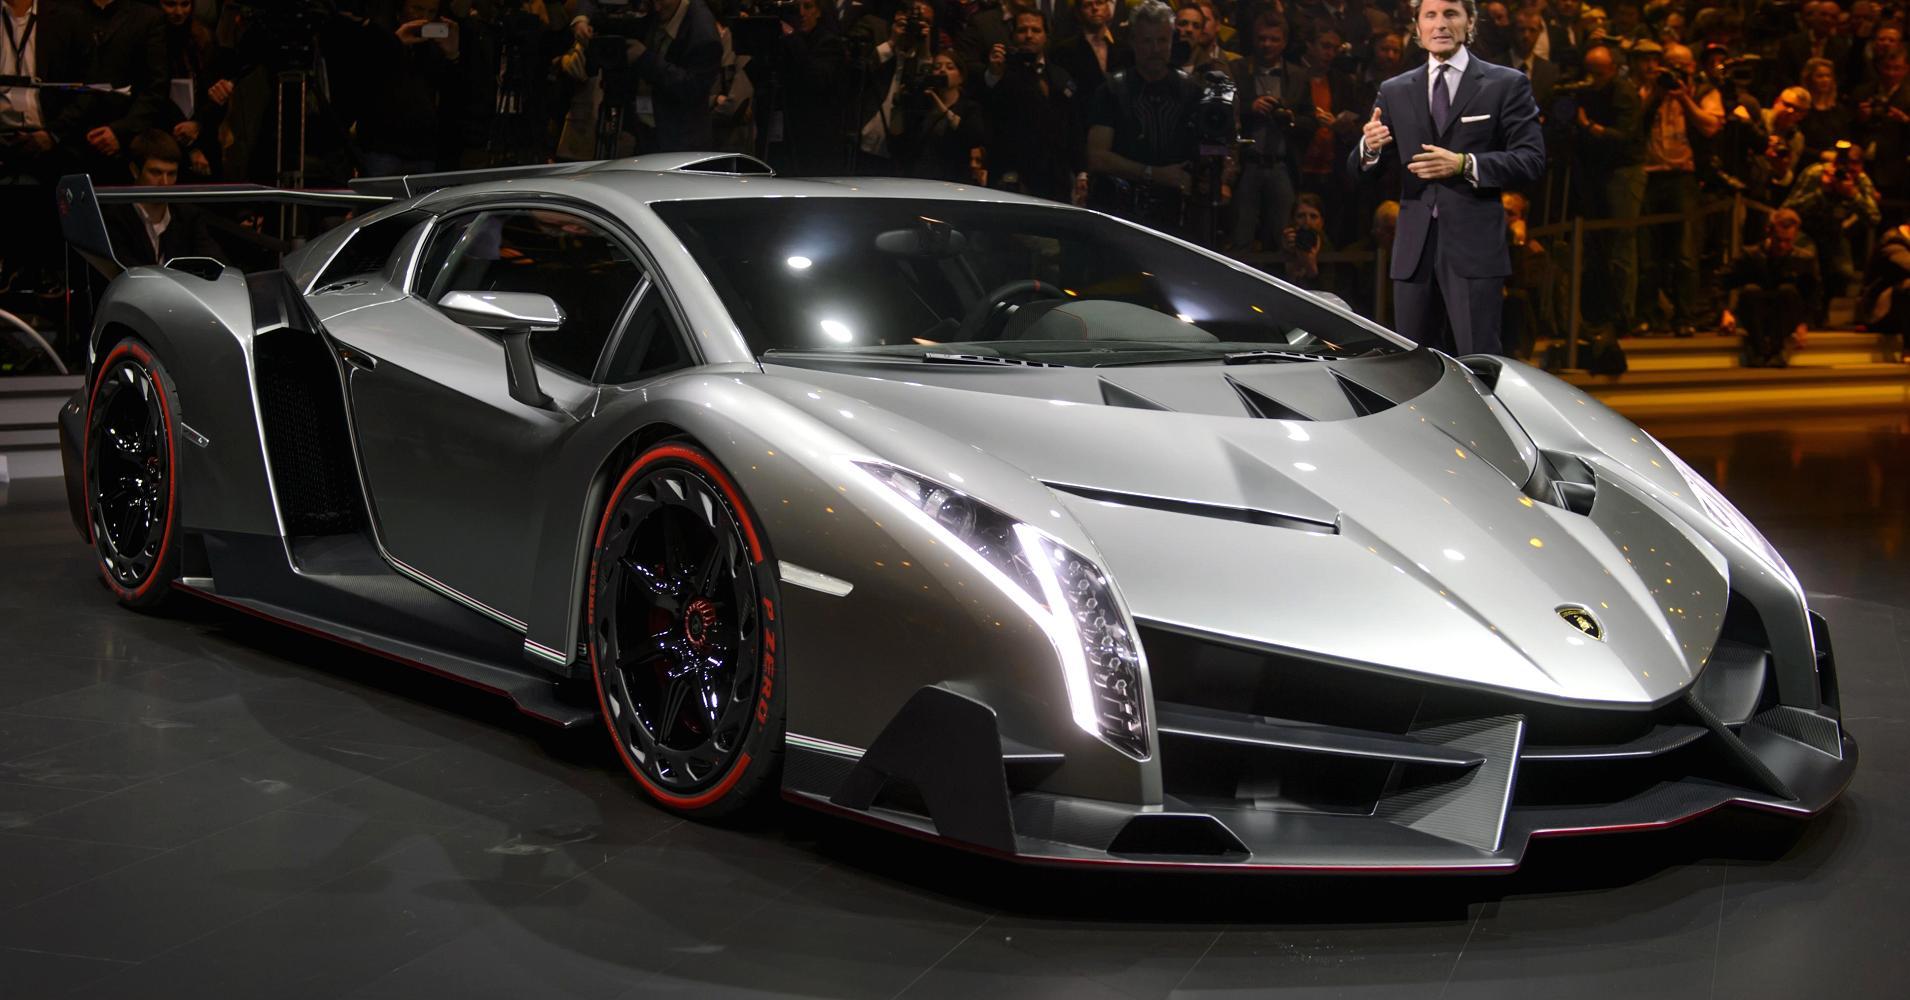 lamborghini-veneno-expensive-car-most-expensive-cars-in-the-world-best-racing-cars-in-the-world